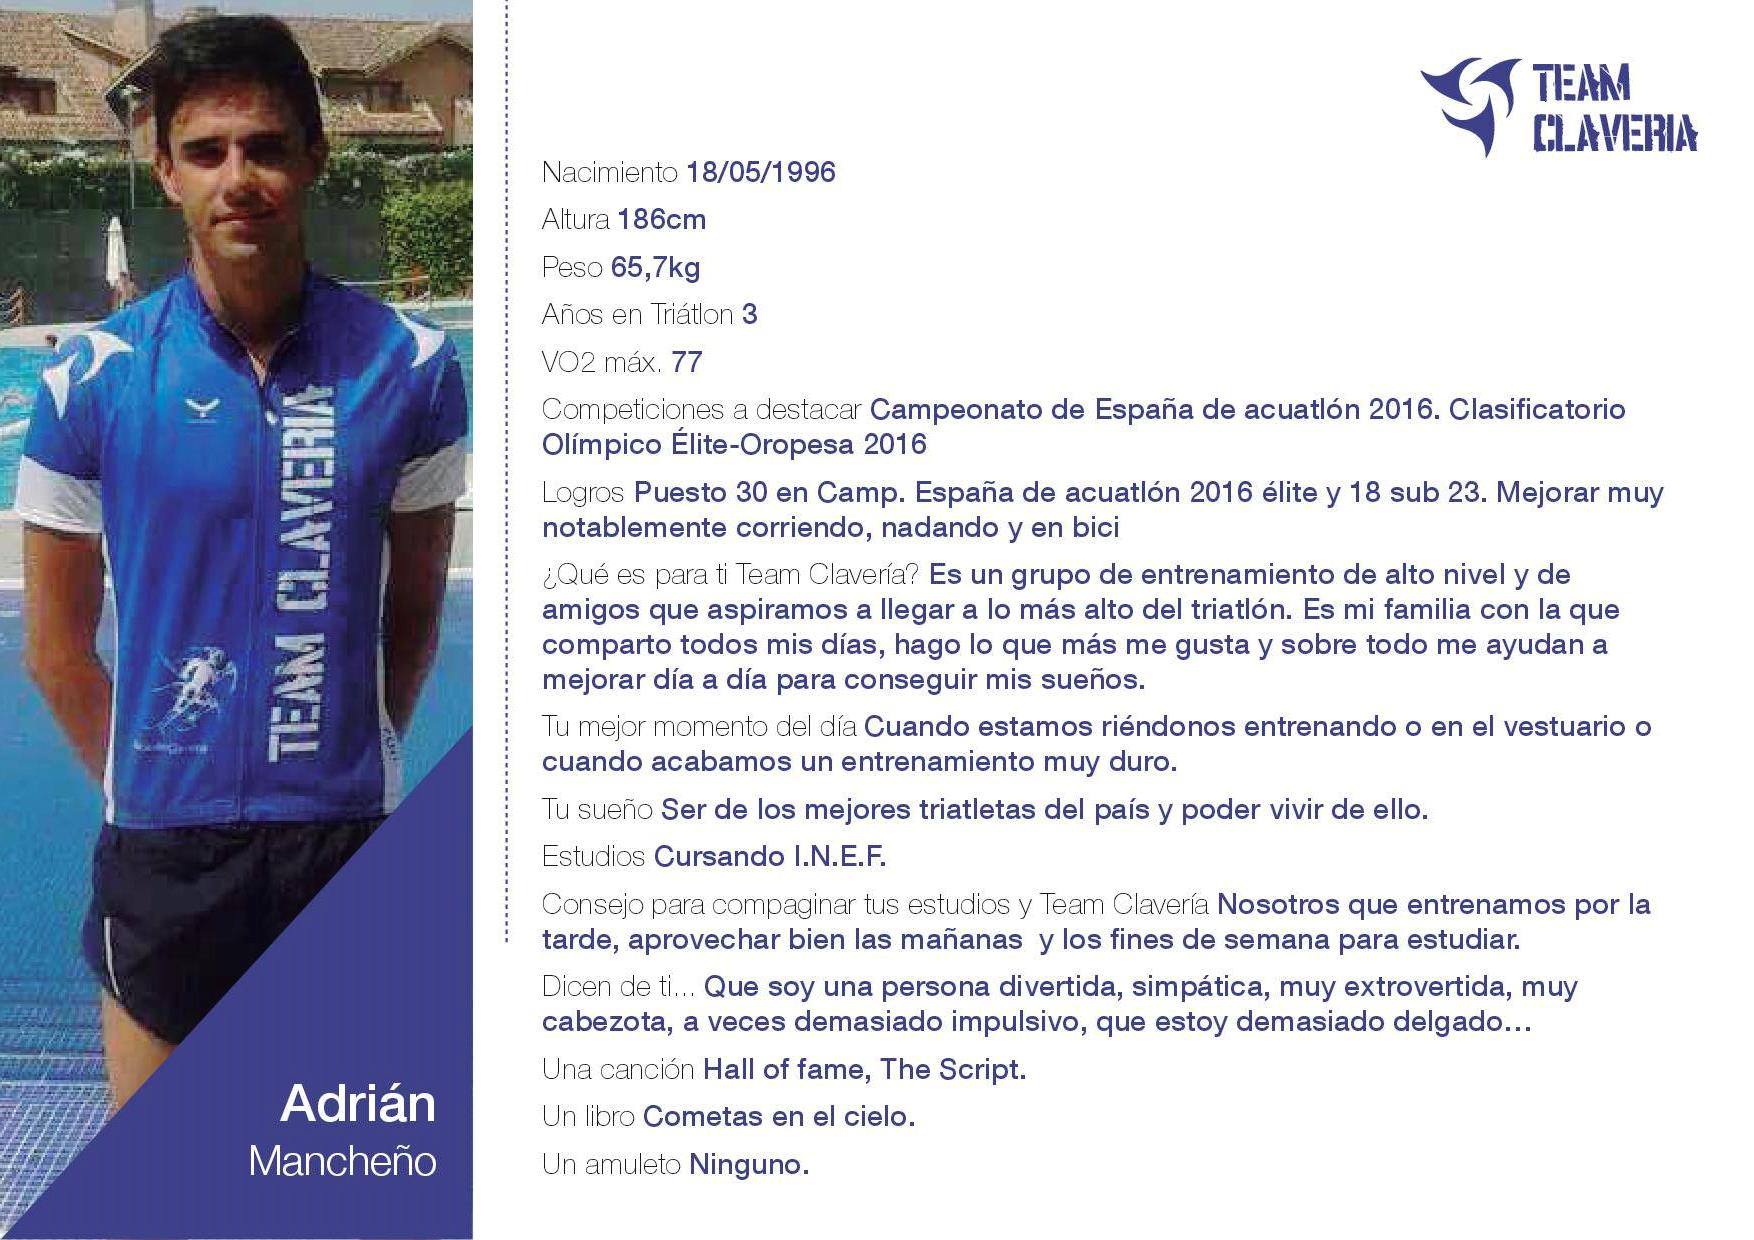 TeamClaveria-Adrián Mancheño